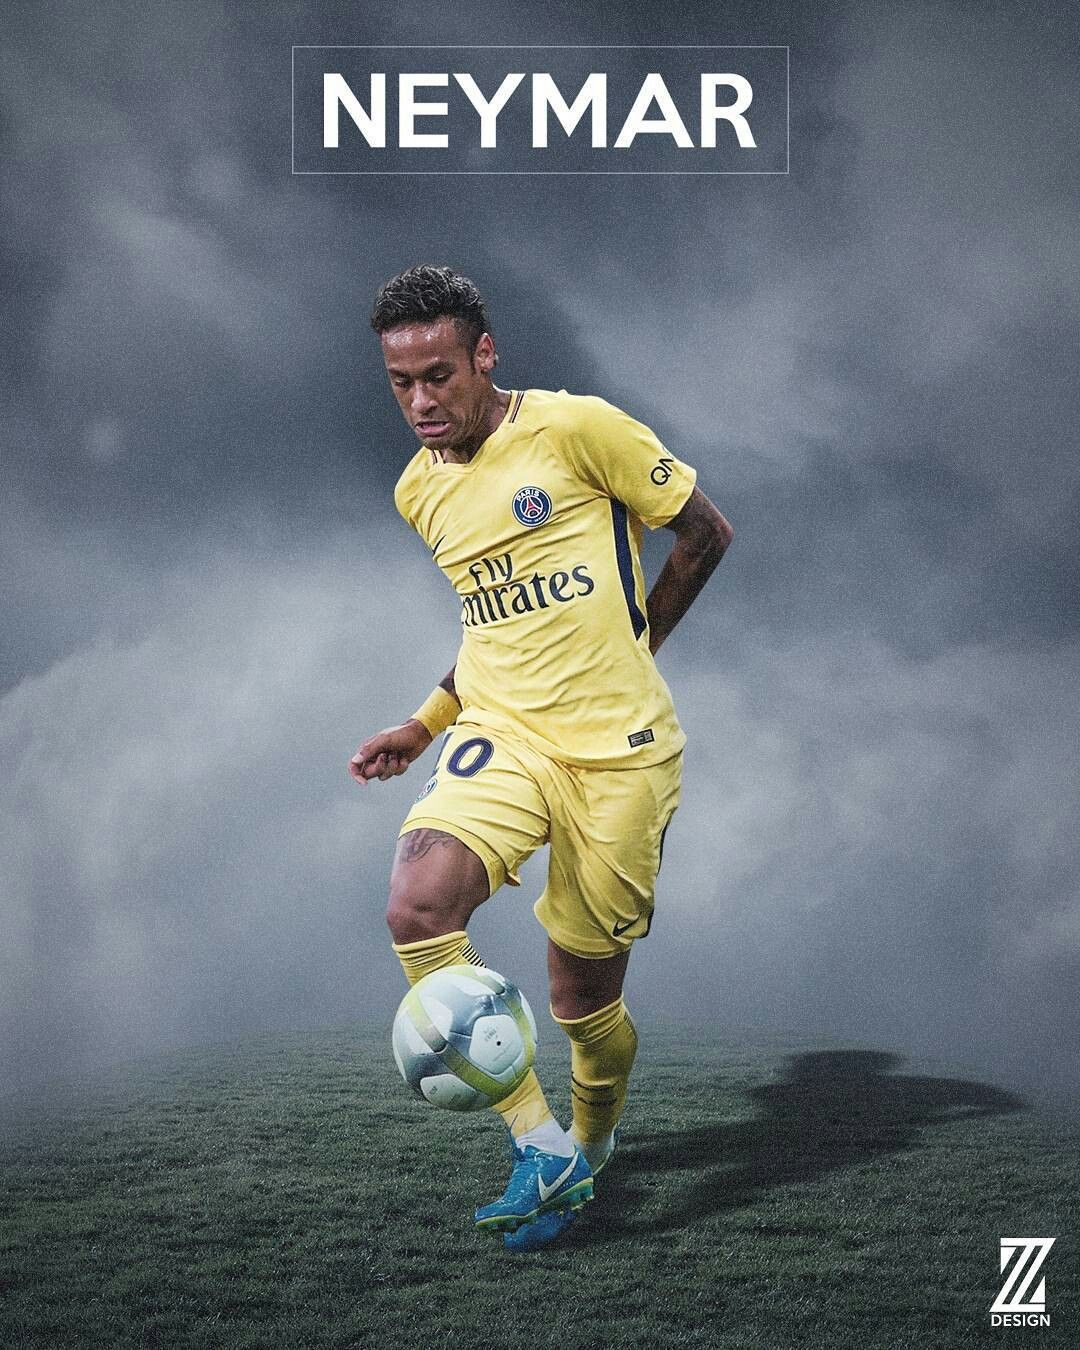 Neymar Junior ⚡⚡⚡ Futebol, Psg, Esportes